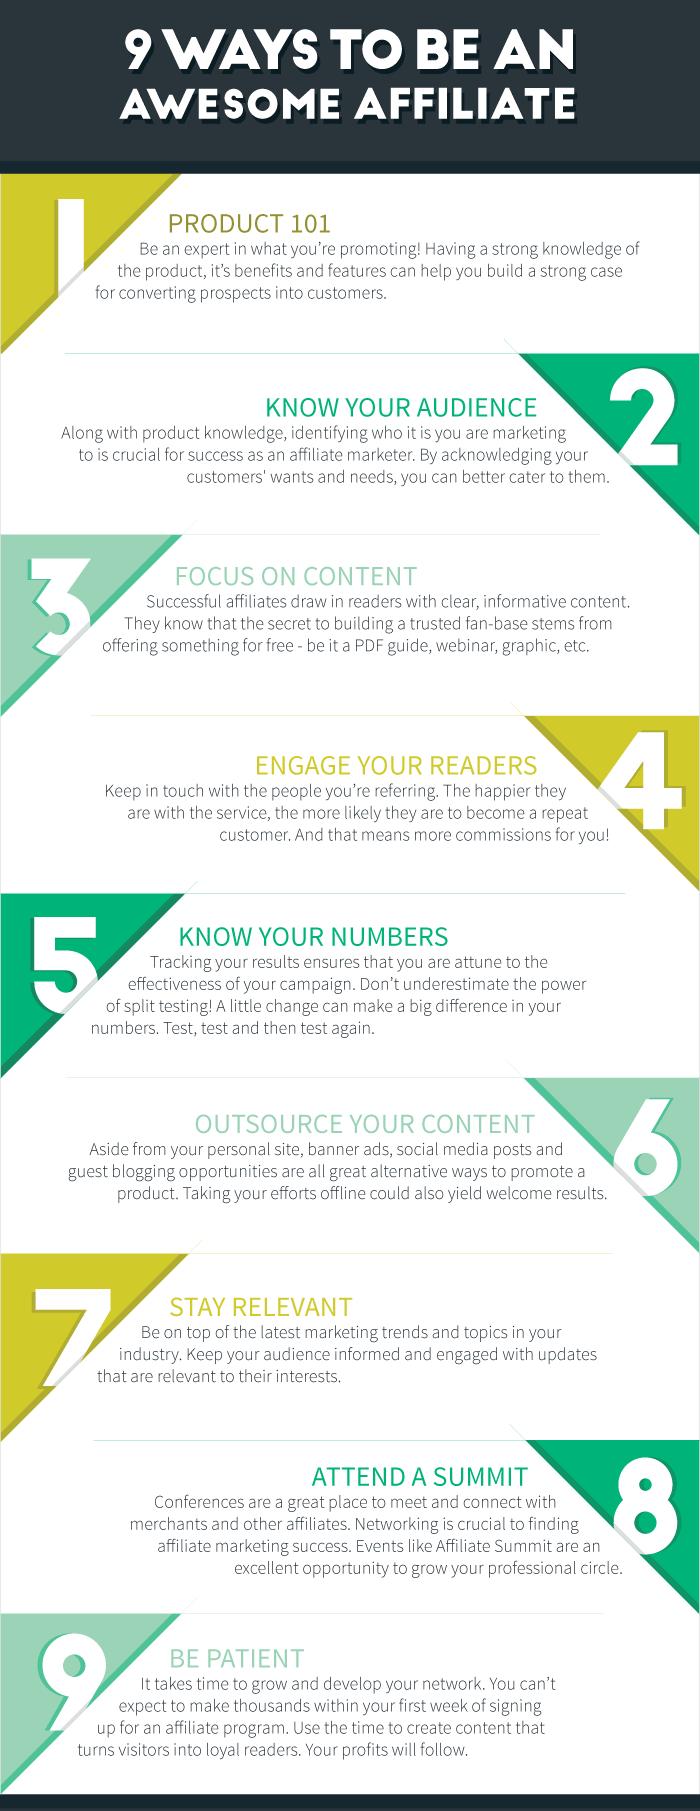 9 passi per diventare un super affiliato